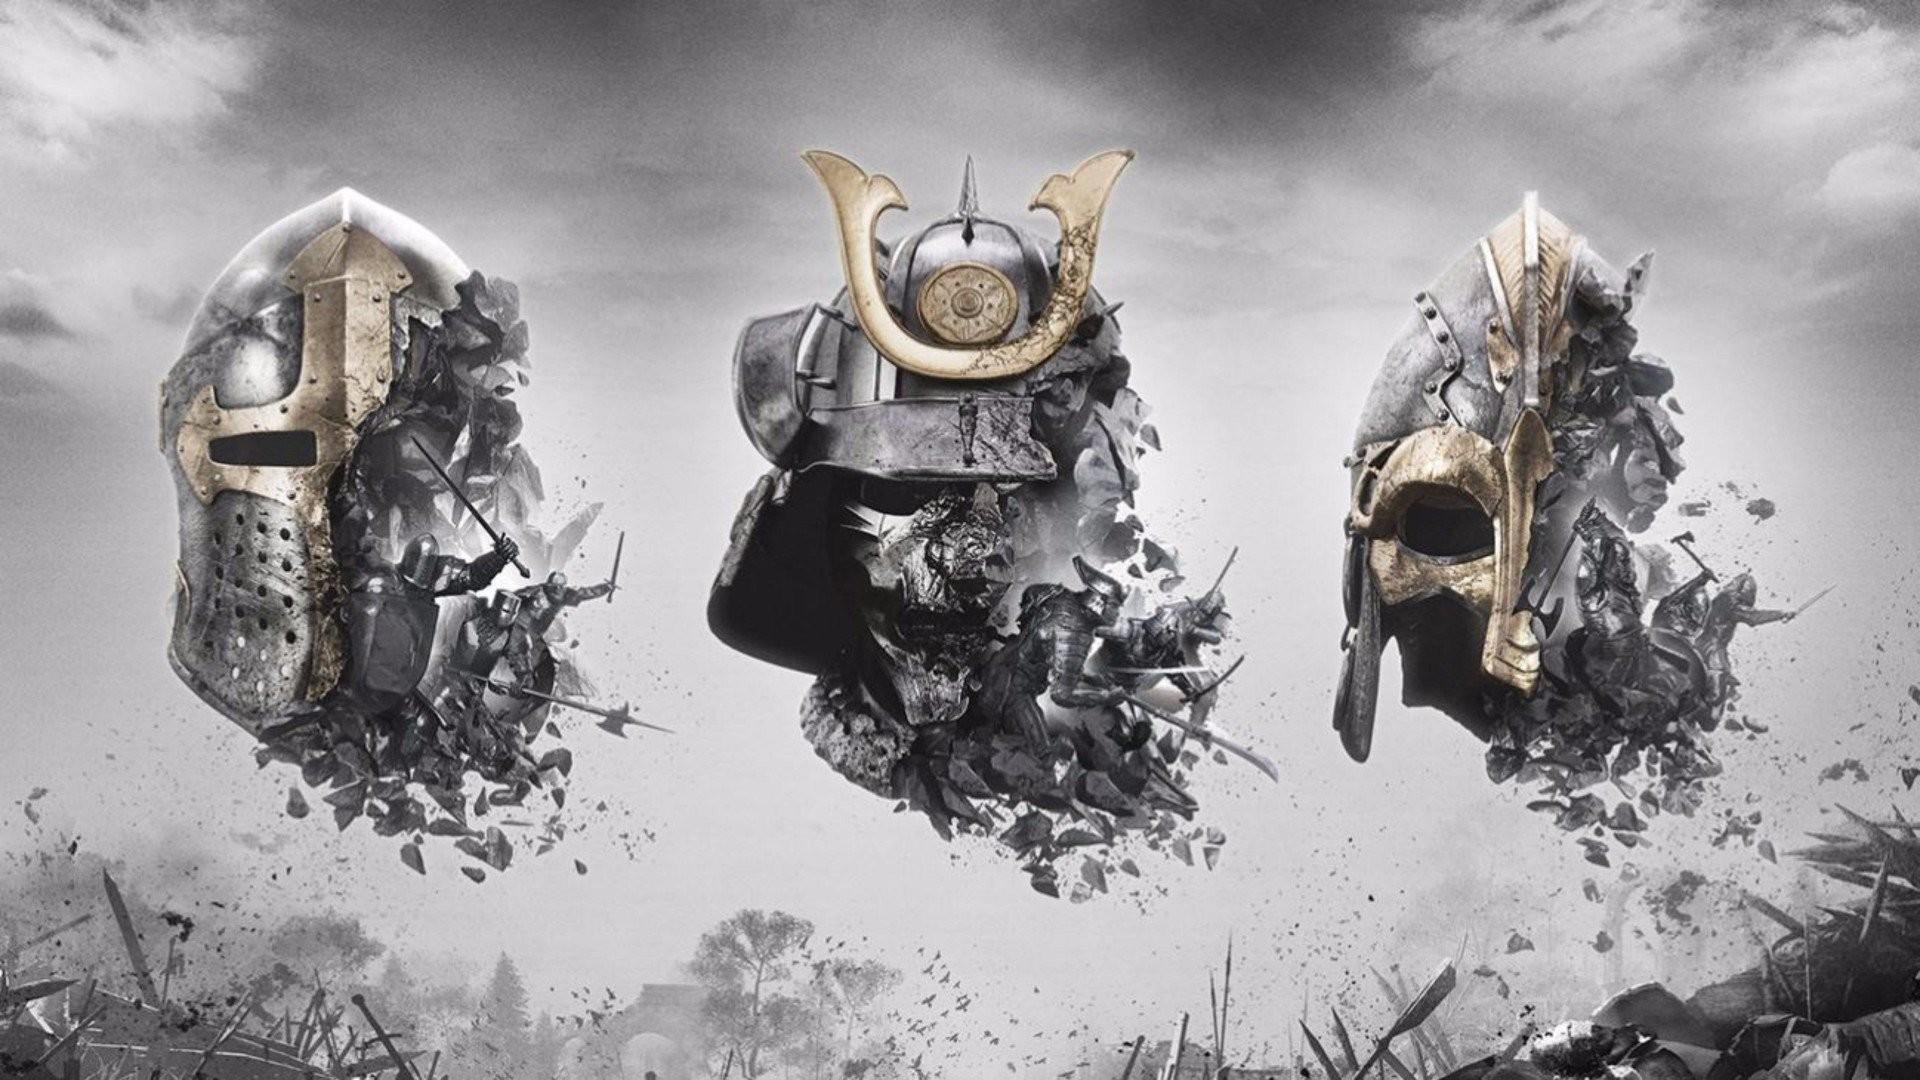 FOR HONOR game video 1fhonor action artwork battle fantasy fighting knight  medieval samurai ubisoft viking warrior wallpaper     1013174    …